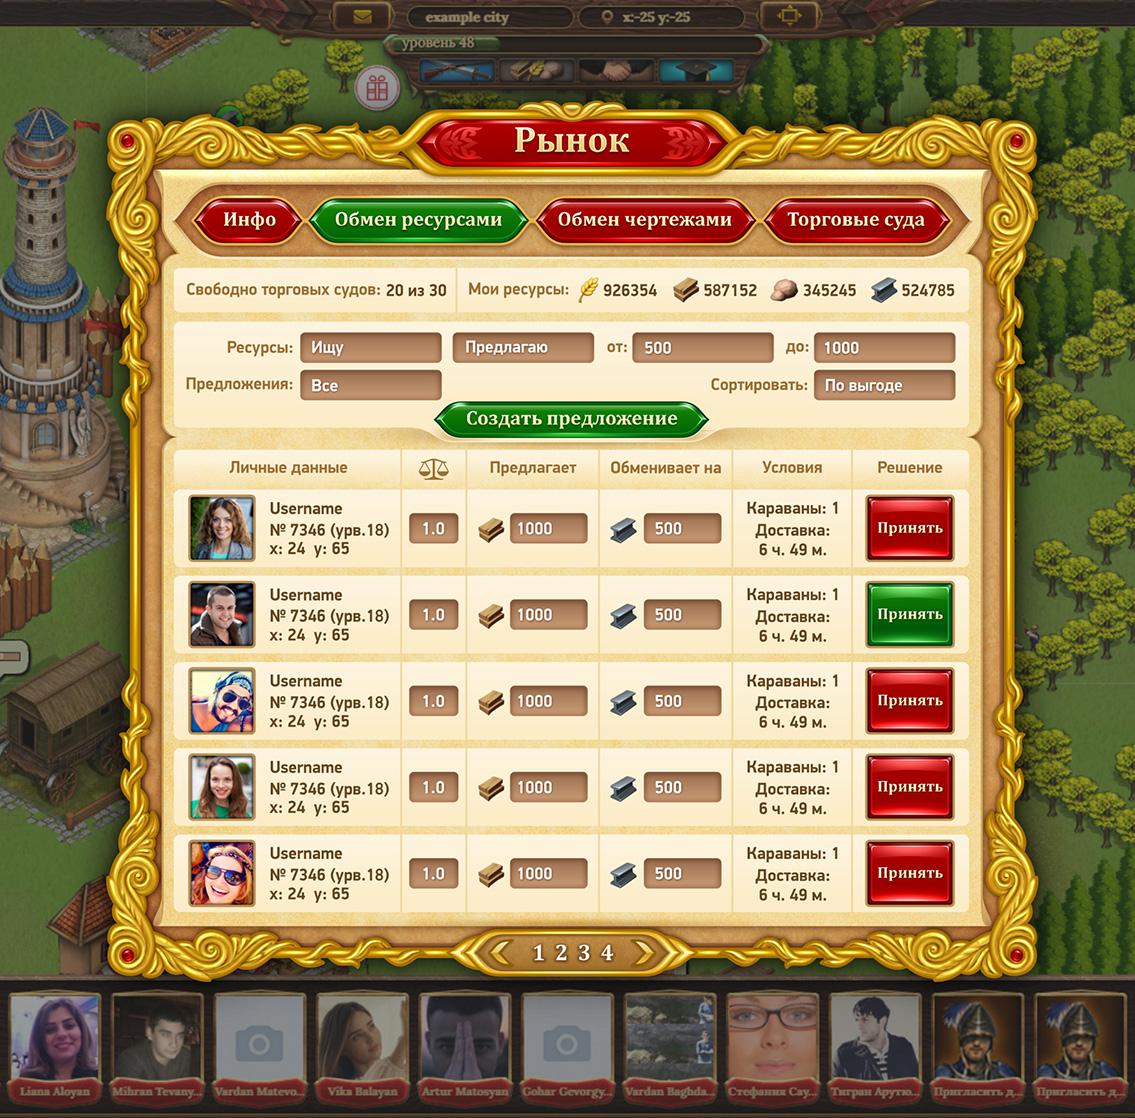 Дизайн окна для игры  фото f_31858b18eacc2cb4.jpg